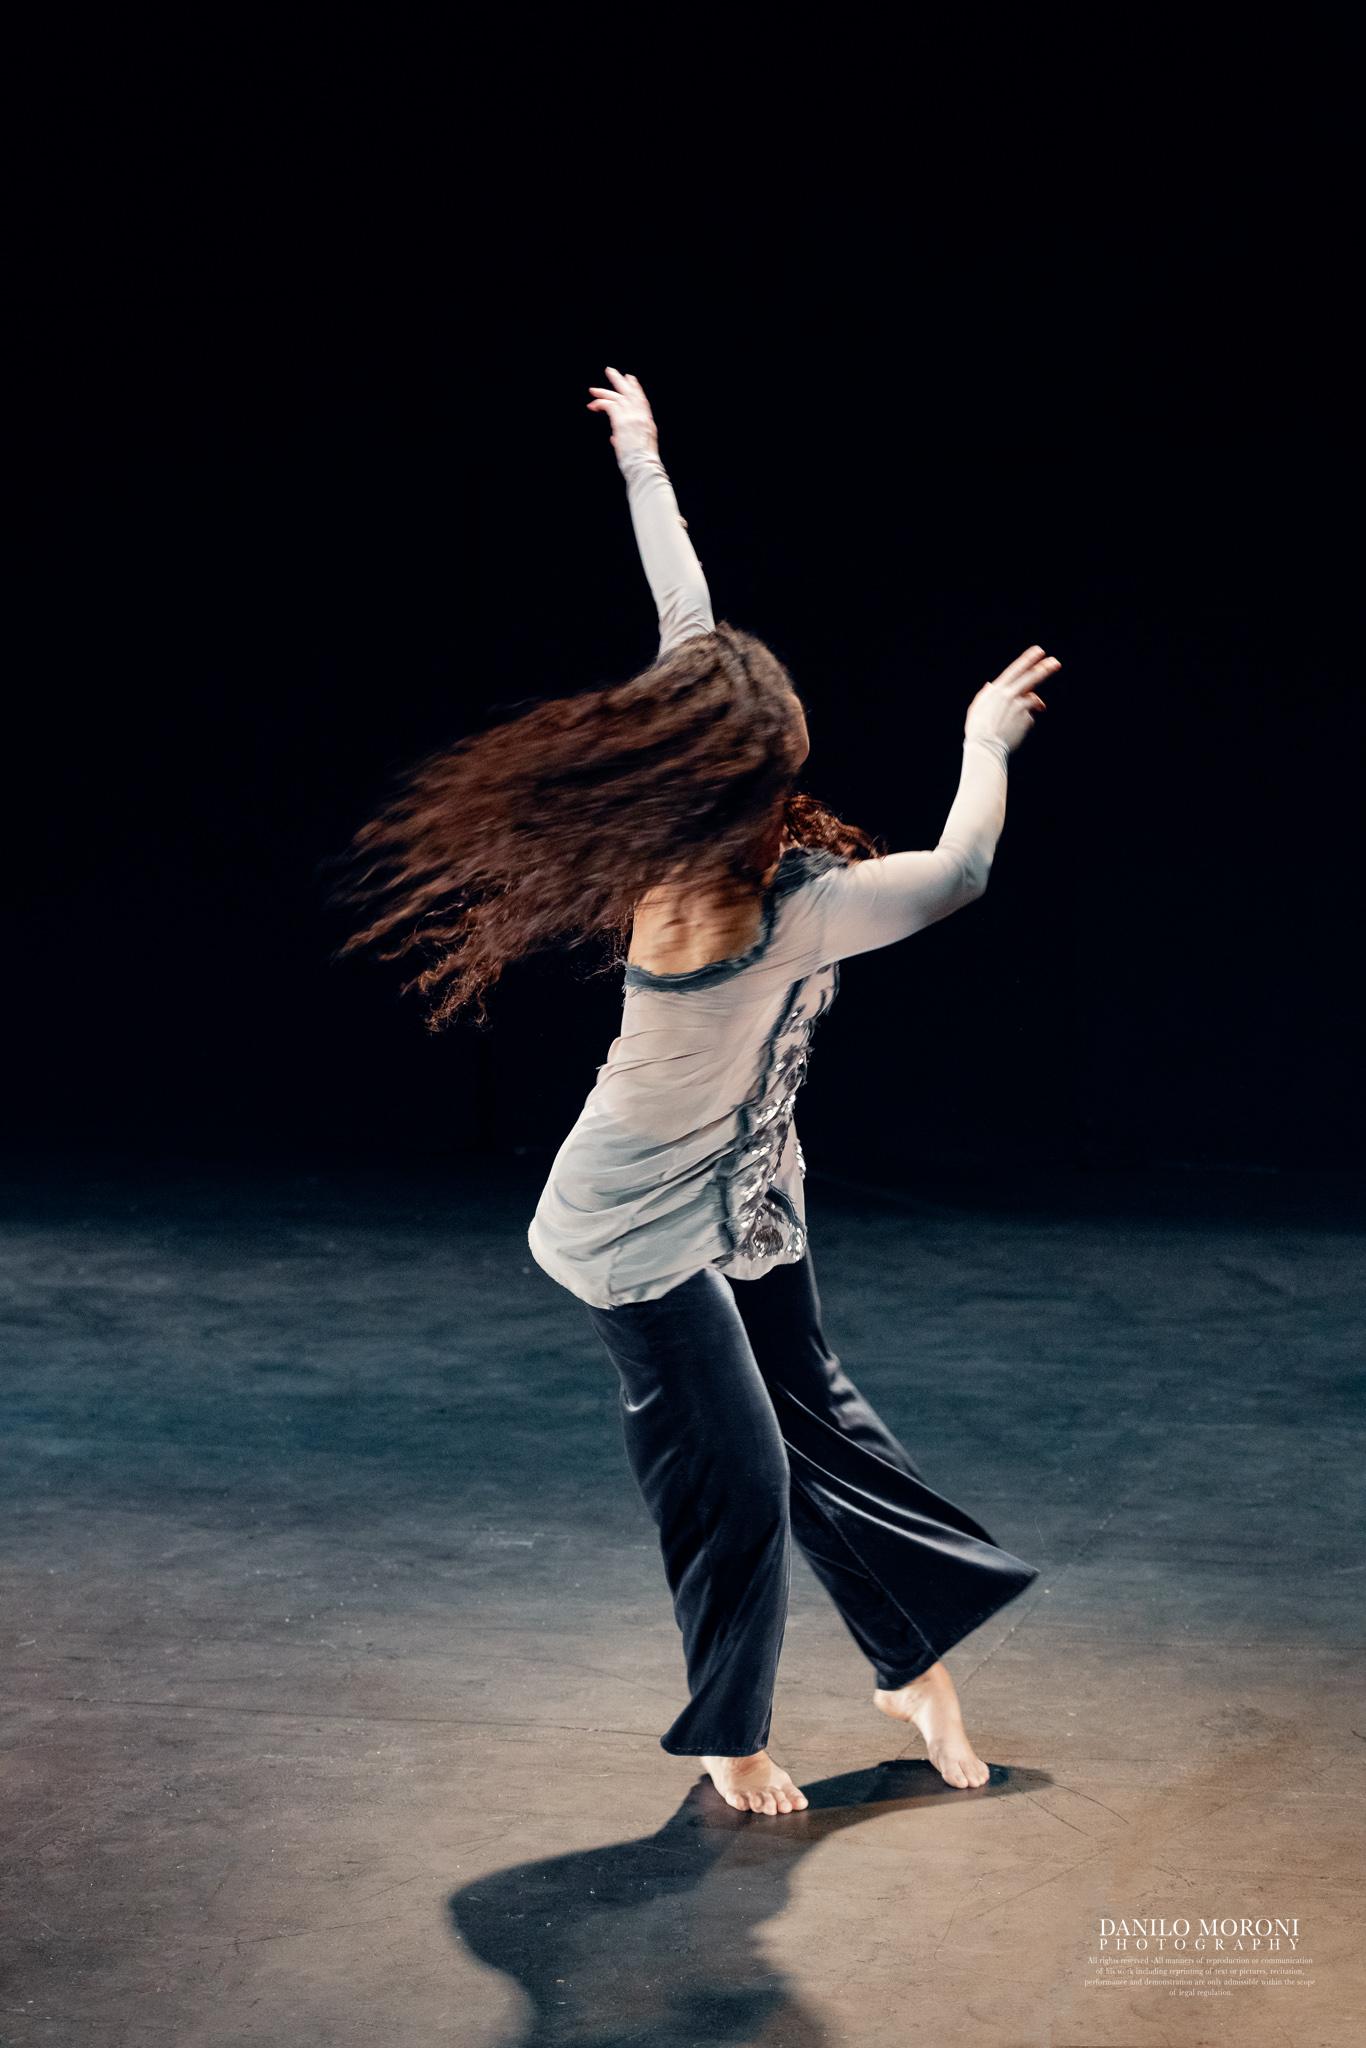 Image of Irene Vazquez En busca de la belleza dance photography, fotografia de escena, fotografo de danza, dance photographer, stage photography